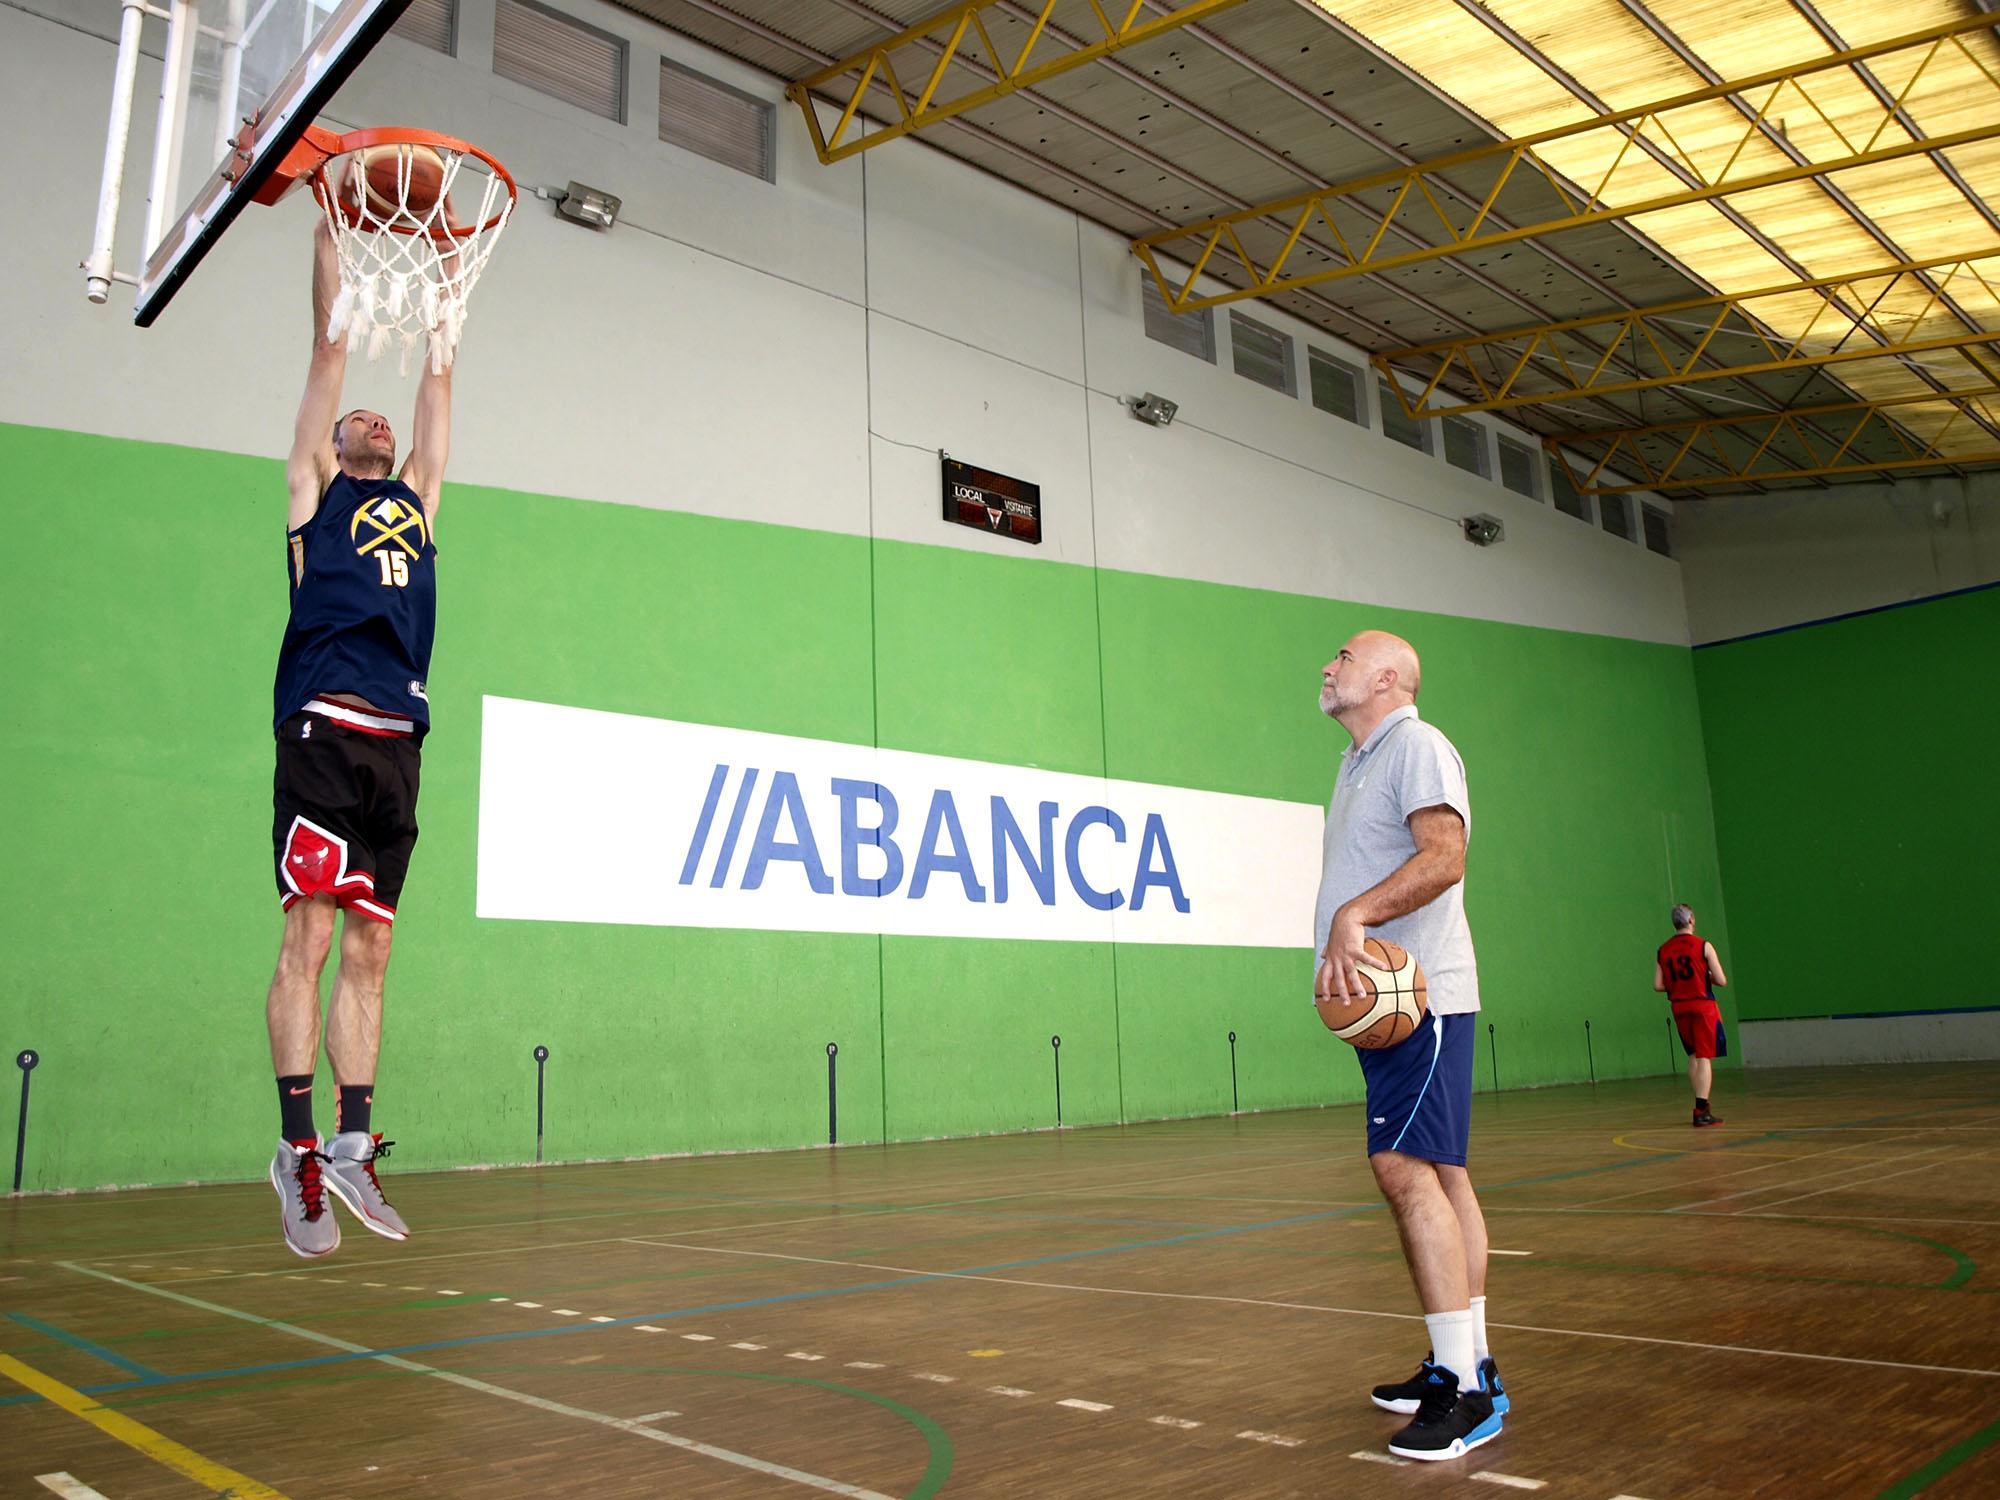 roberto canella ureca baloncesto 3